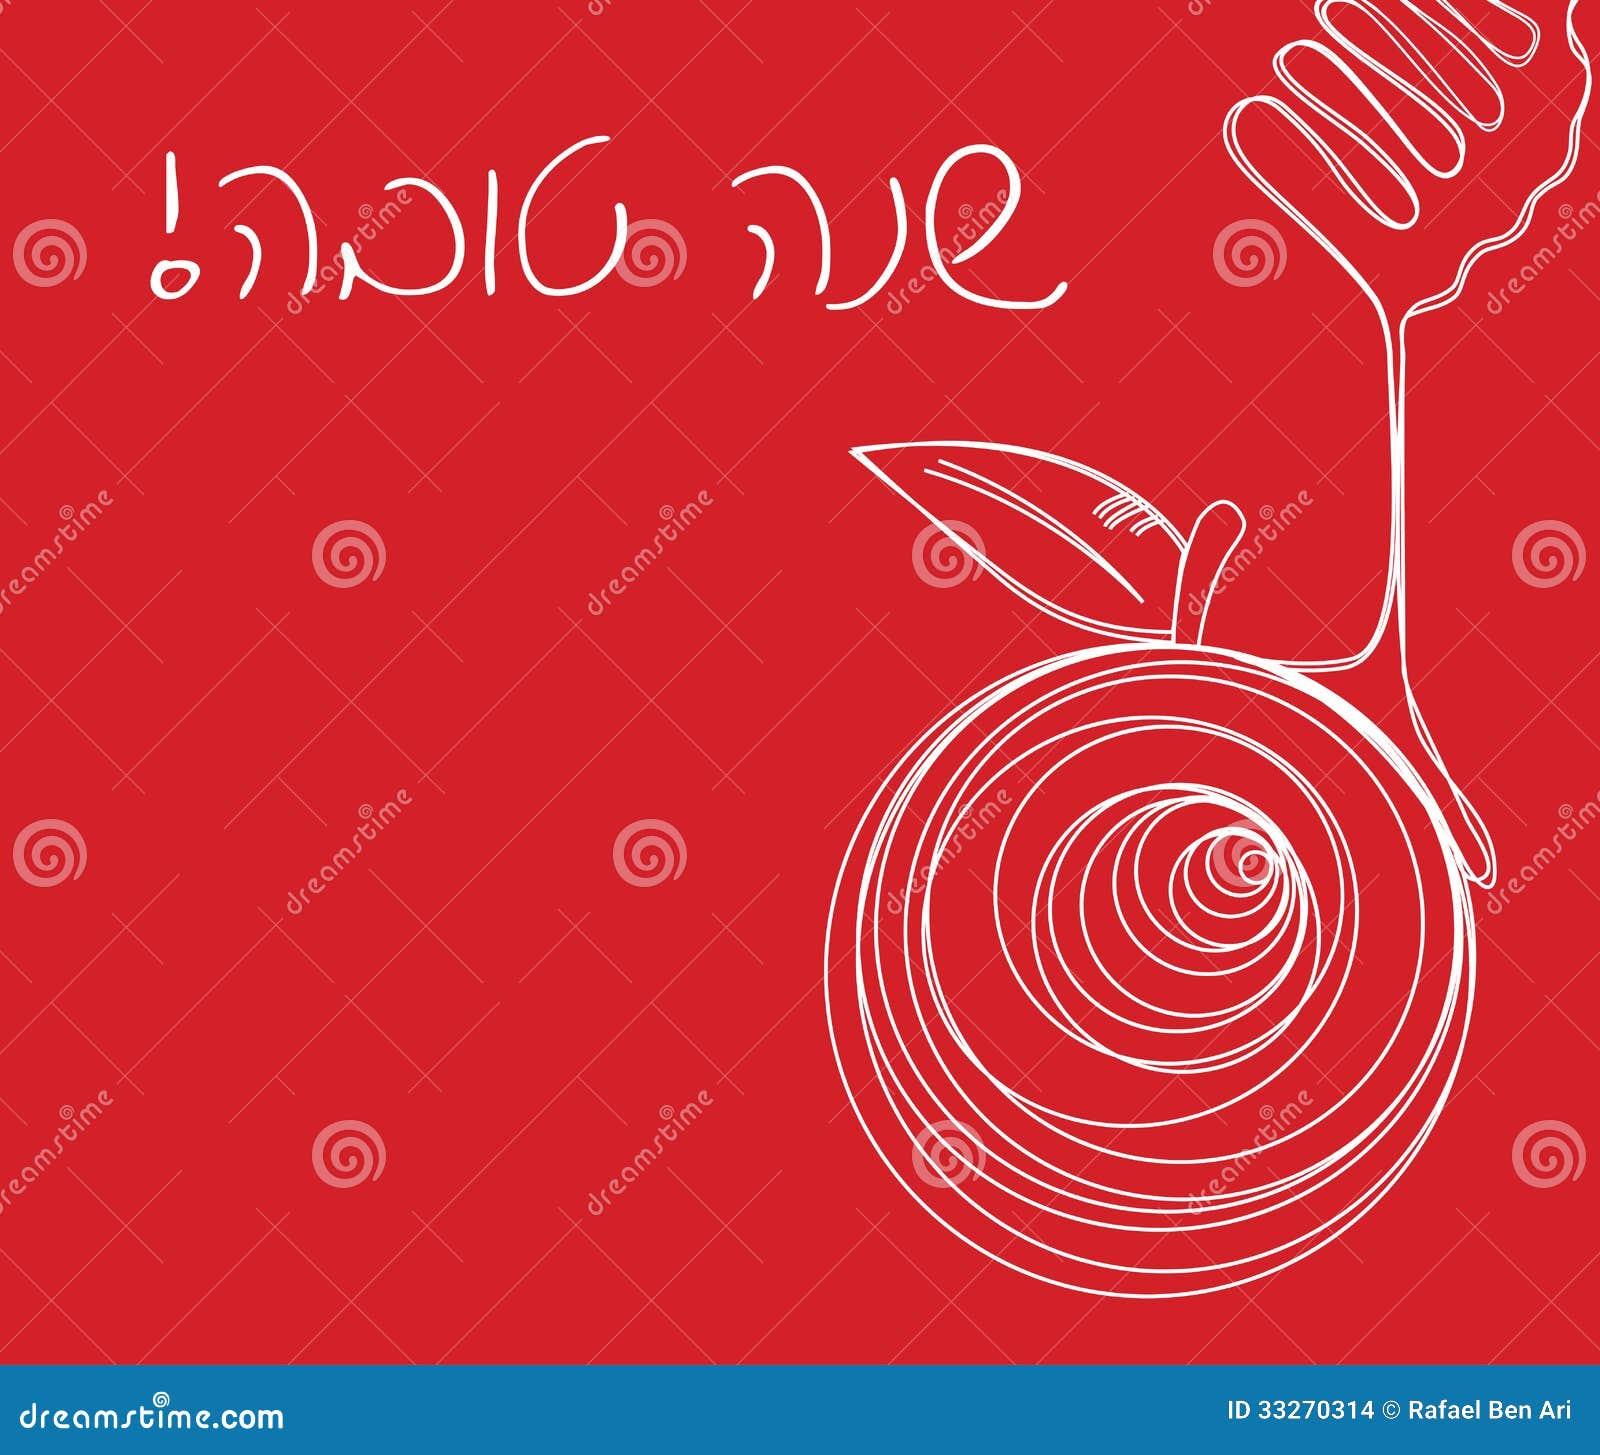 Vector illustration - Rosh Hashana Greeting Card